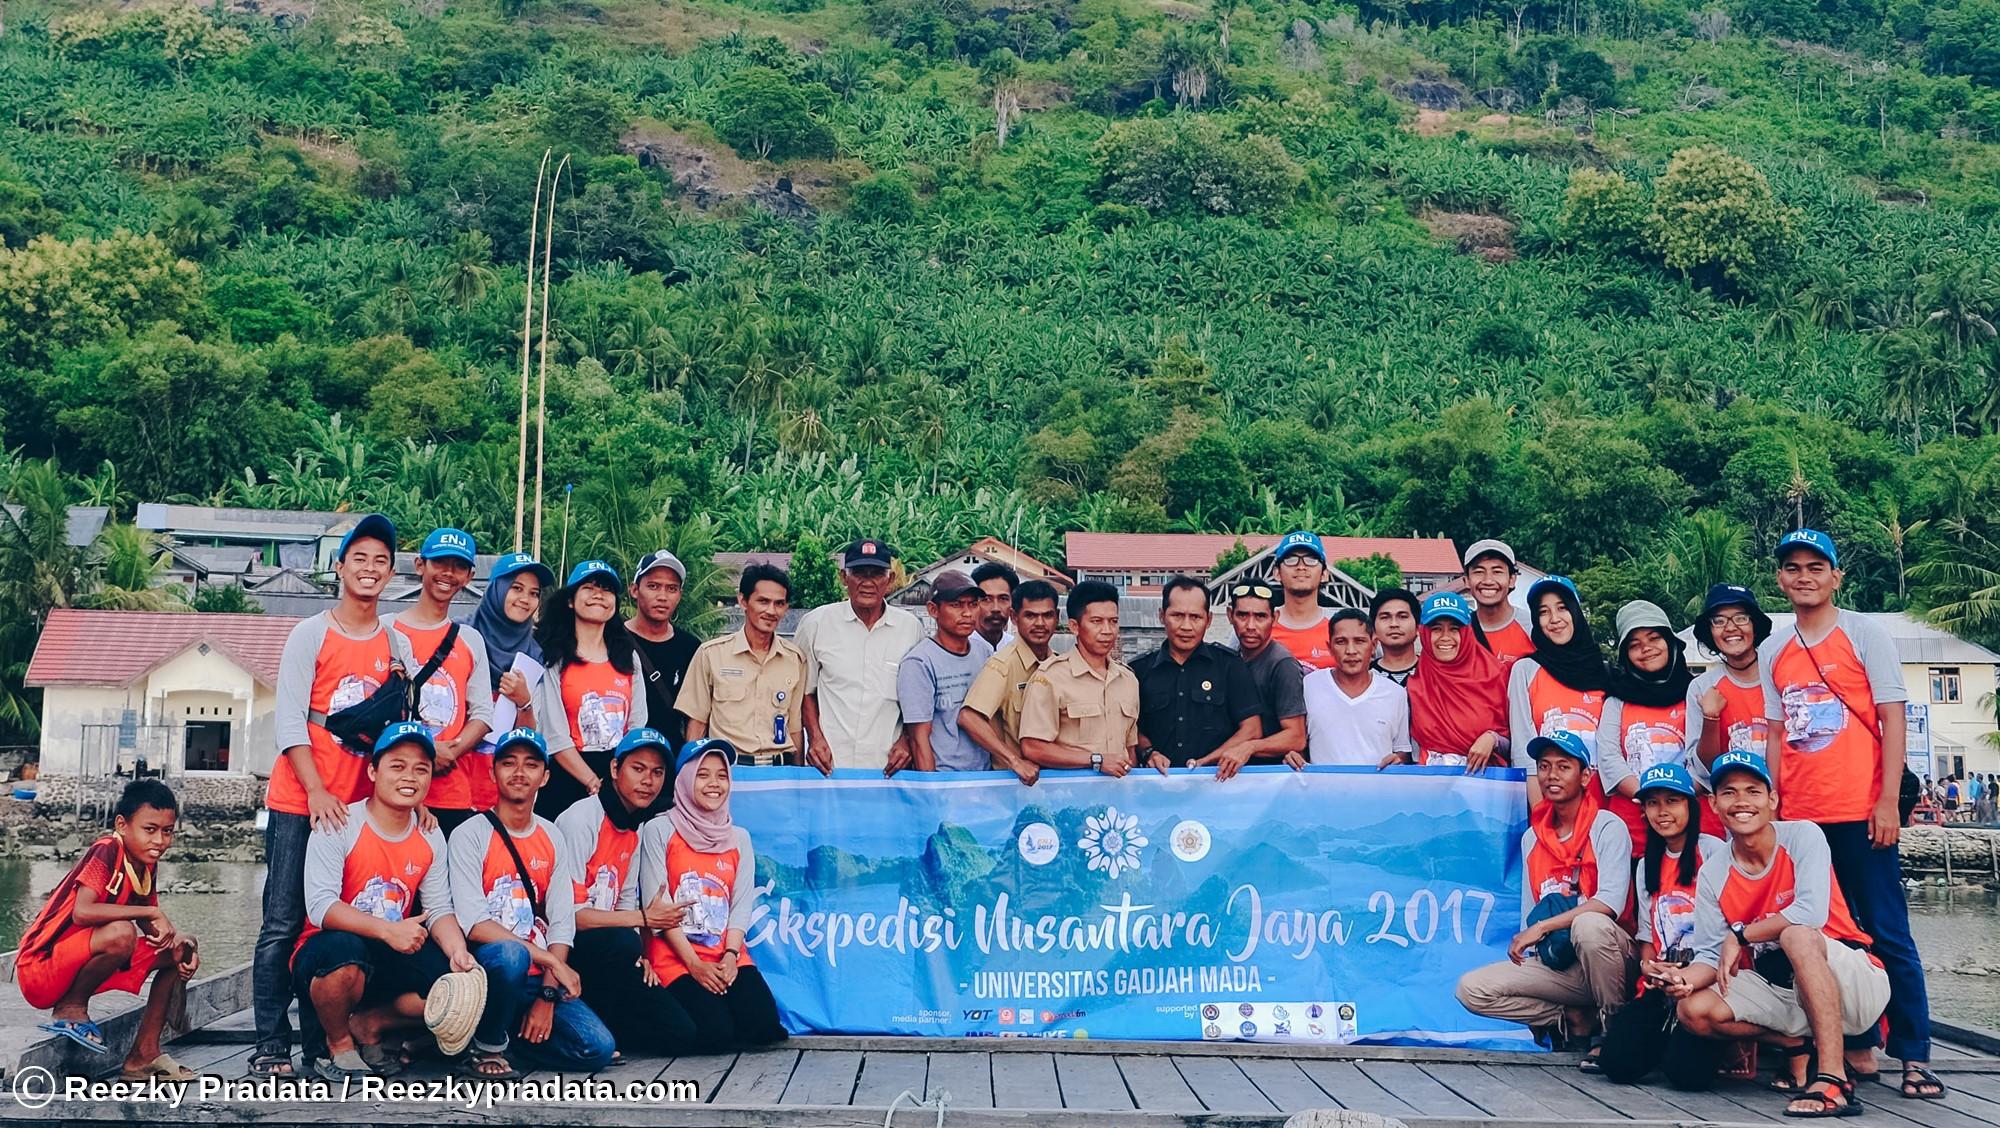 Cerita Ekspedisi Nusantara Jaya 2017 UGM : 3 Hari Nikmati Eksotika Pulau Maradapan